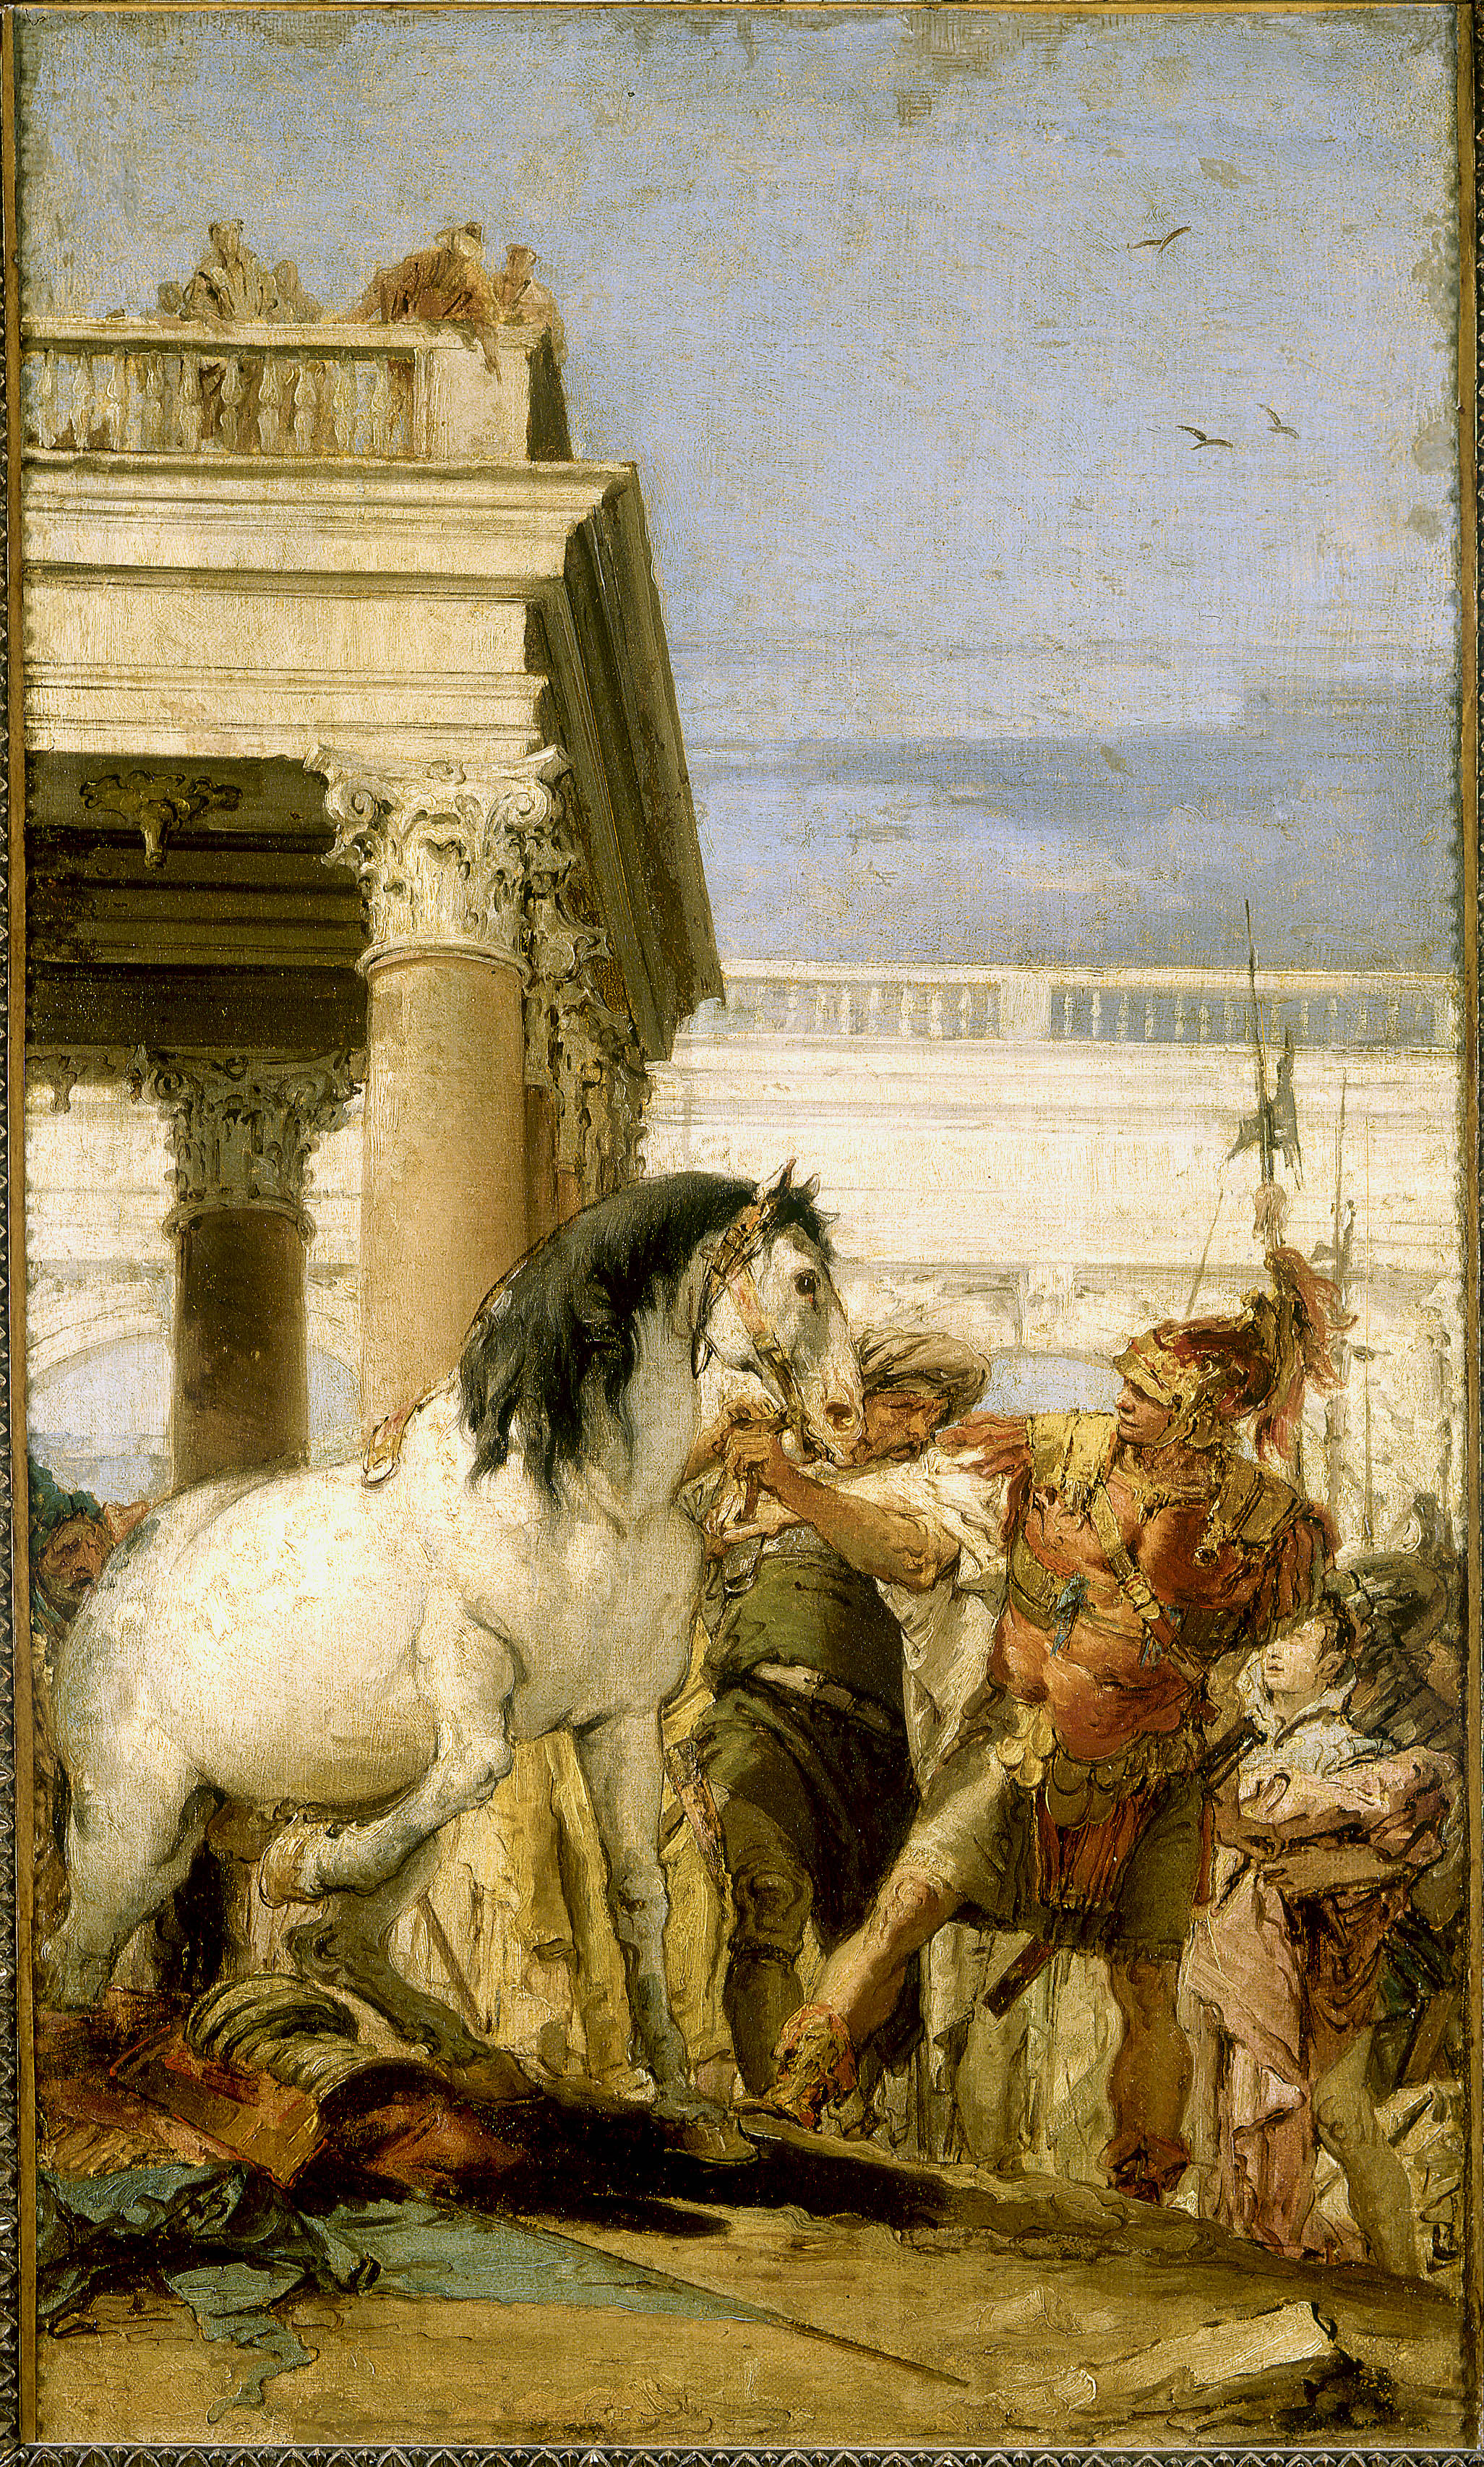 Giambattista Tiepolo - Alexandre et Bucéphale